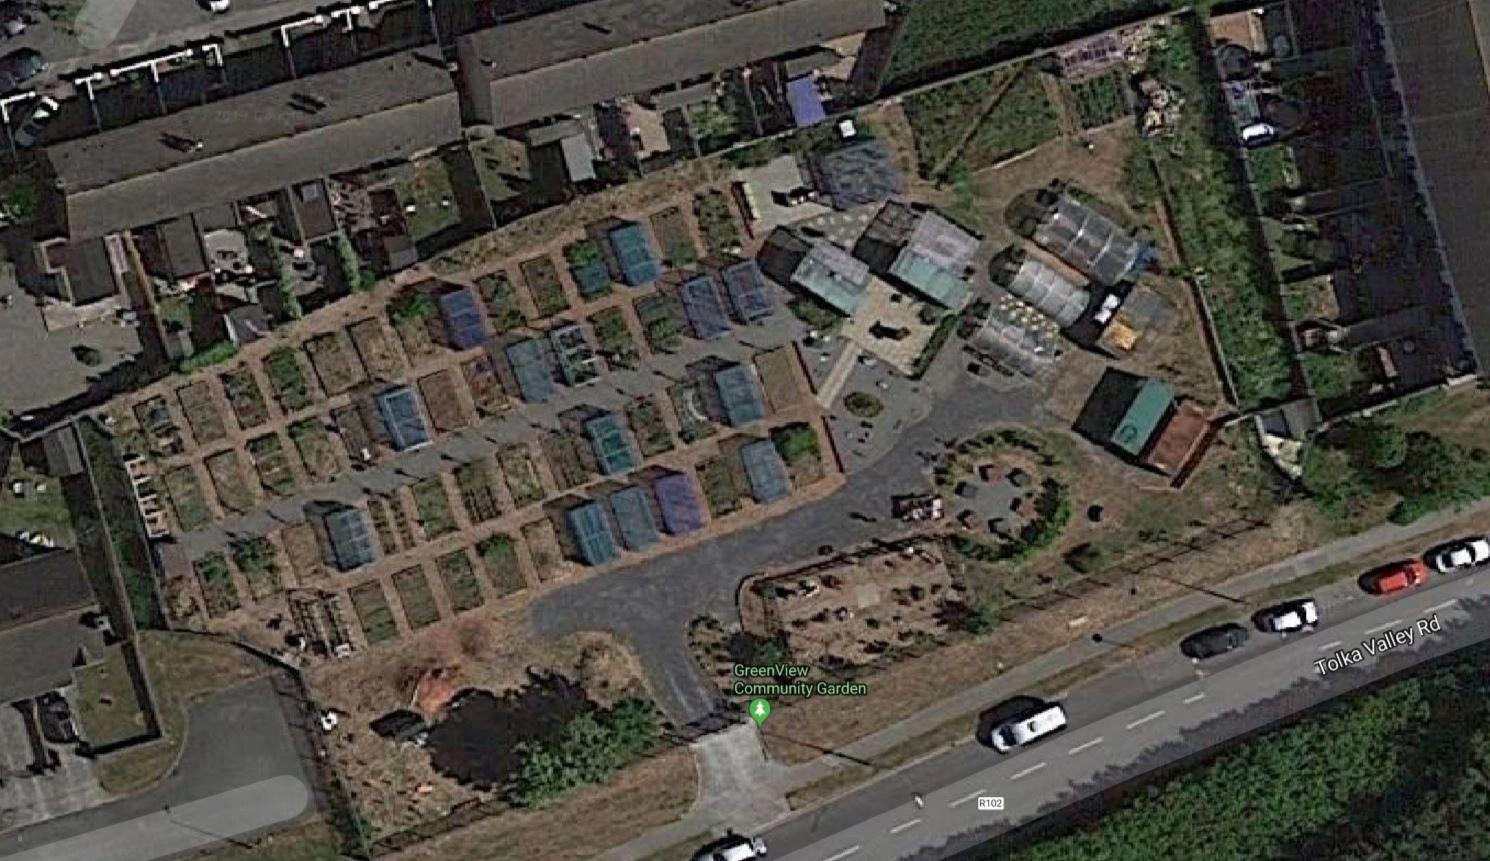 Greenview Garden Plan